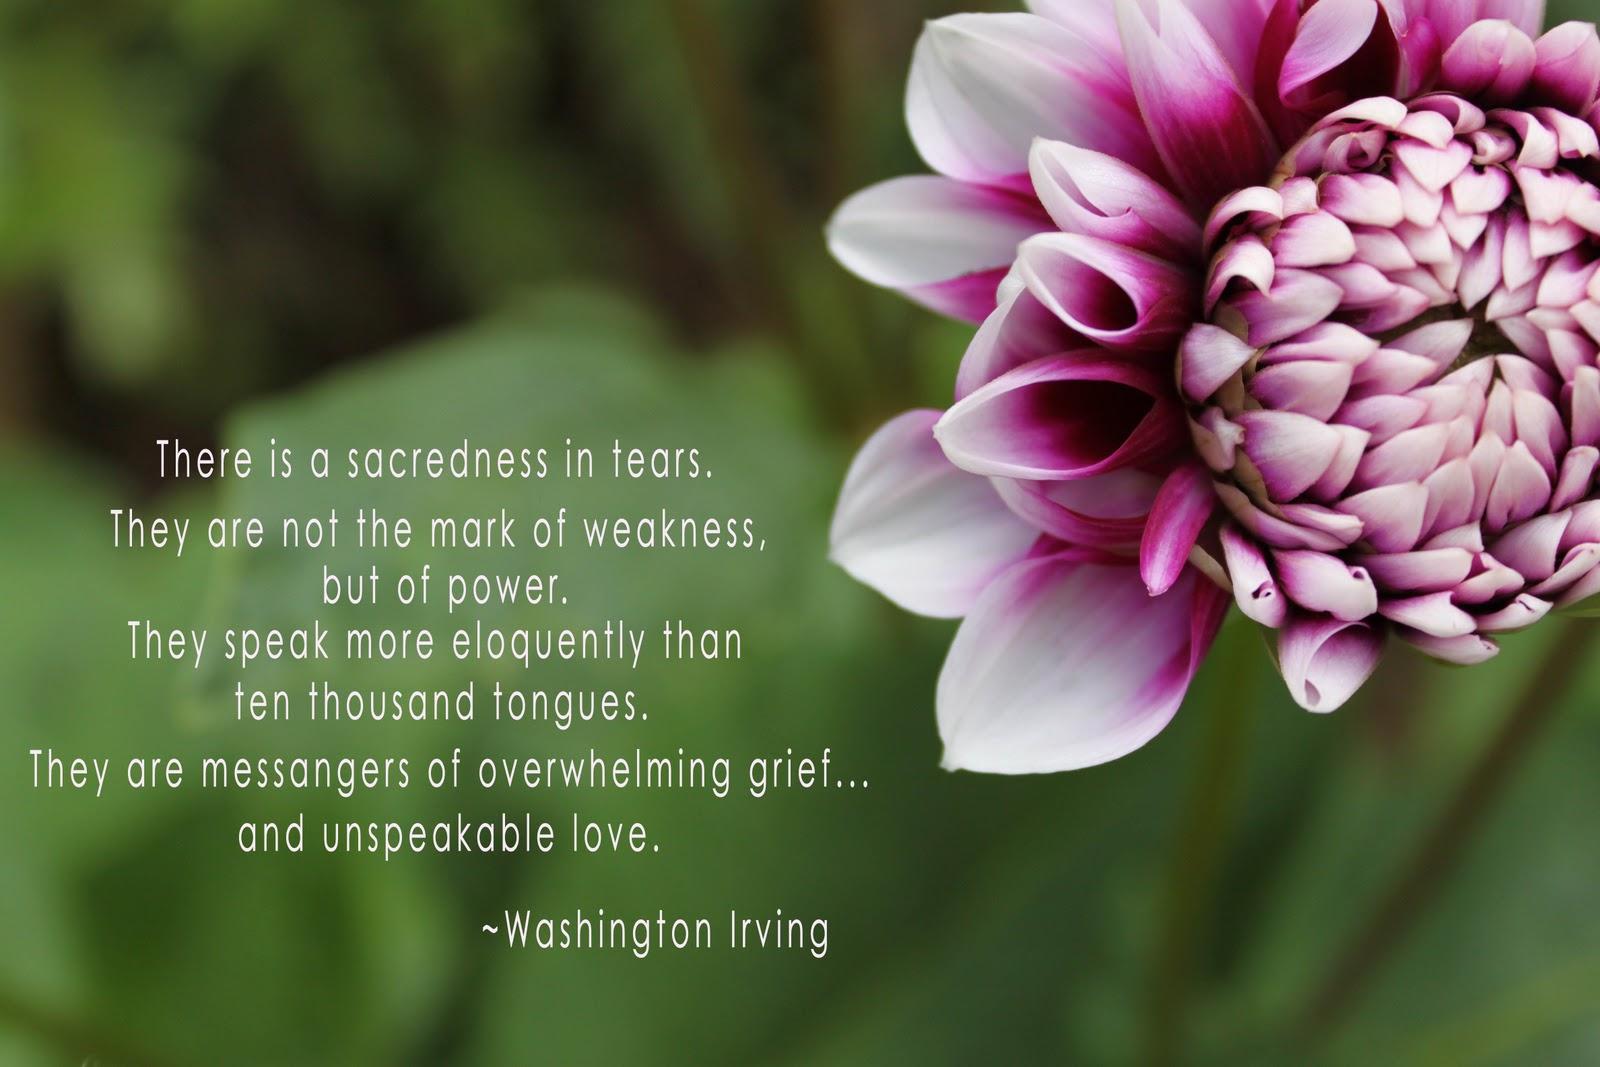 Washington Irving's quote #1